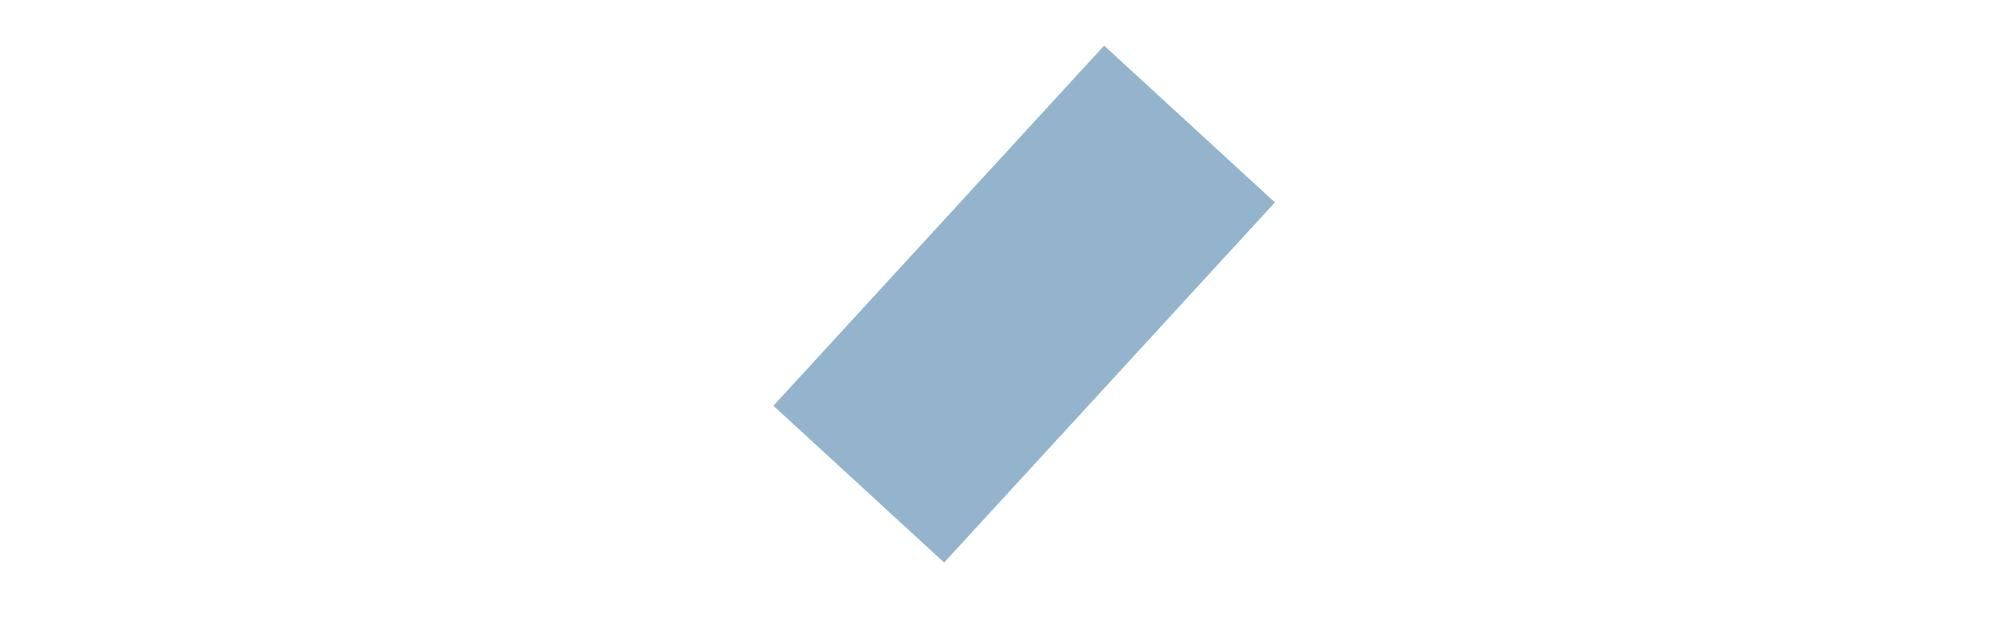 Learning-icon.jpg